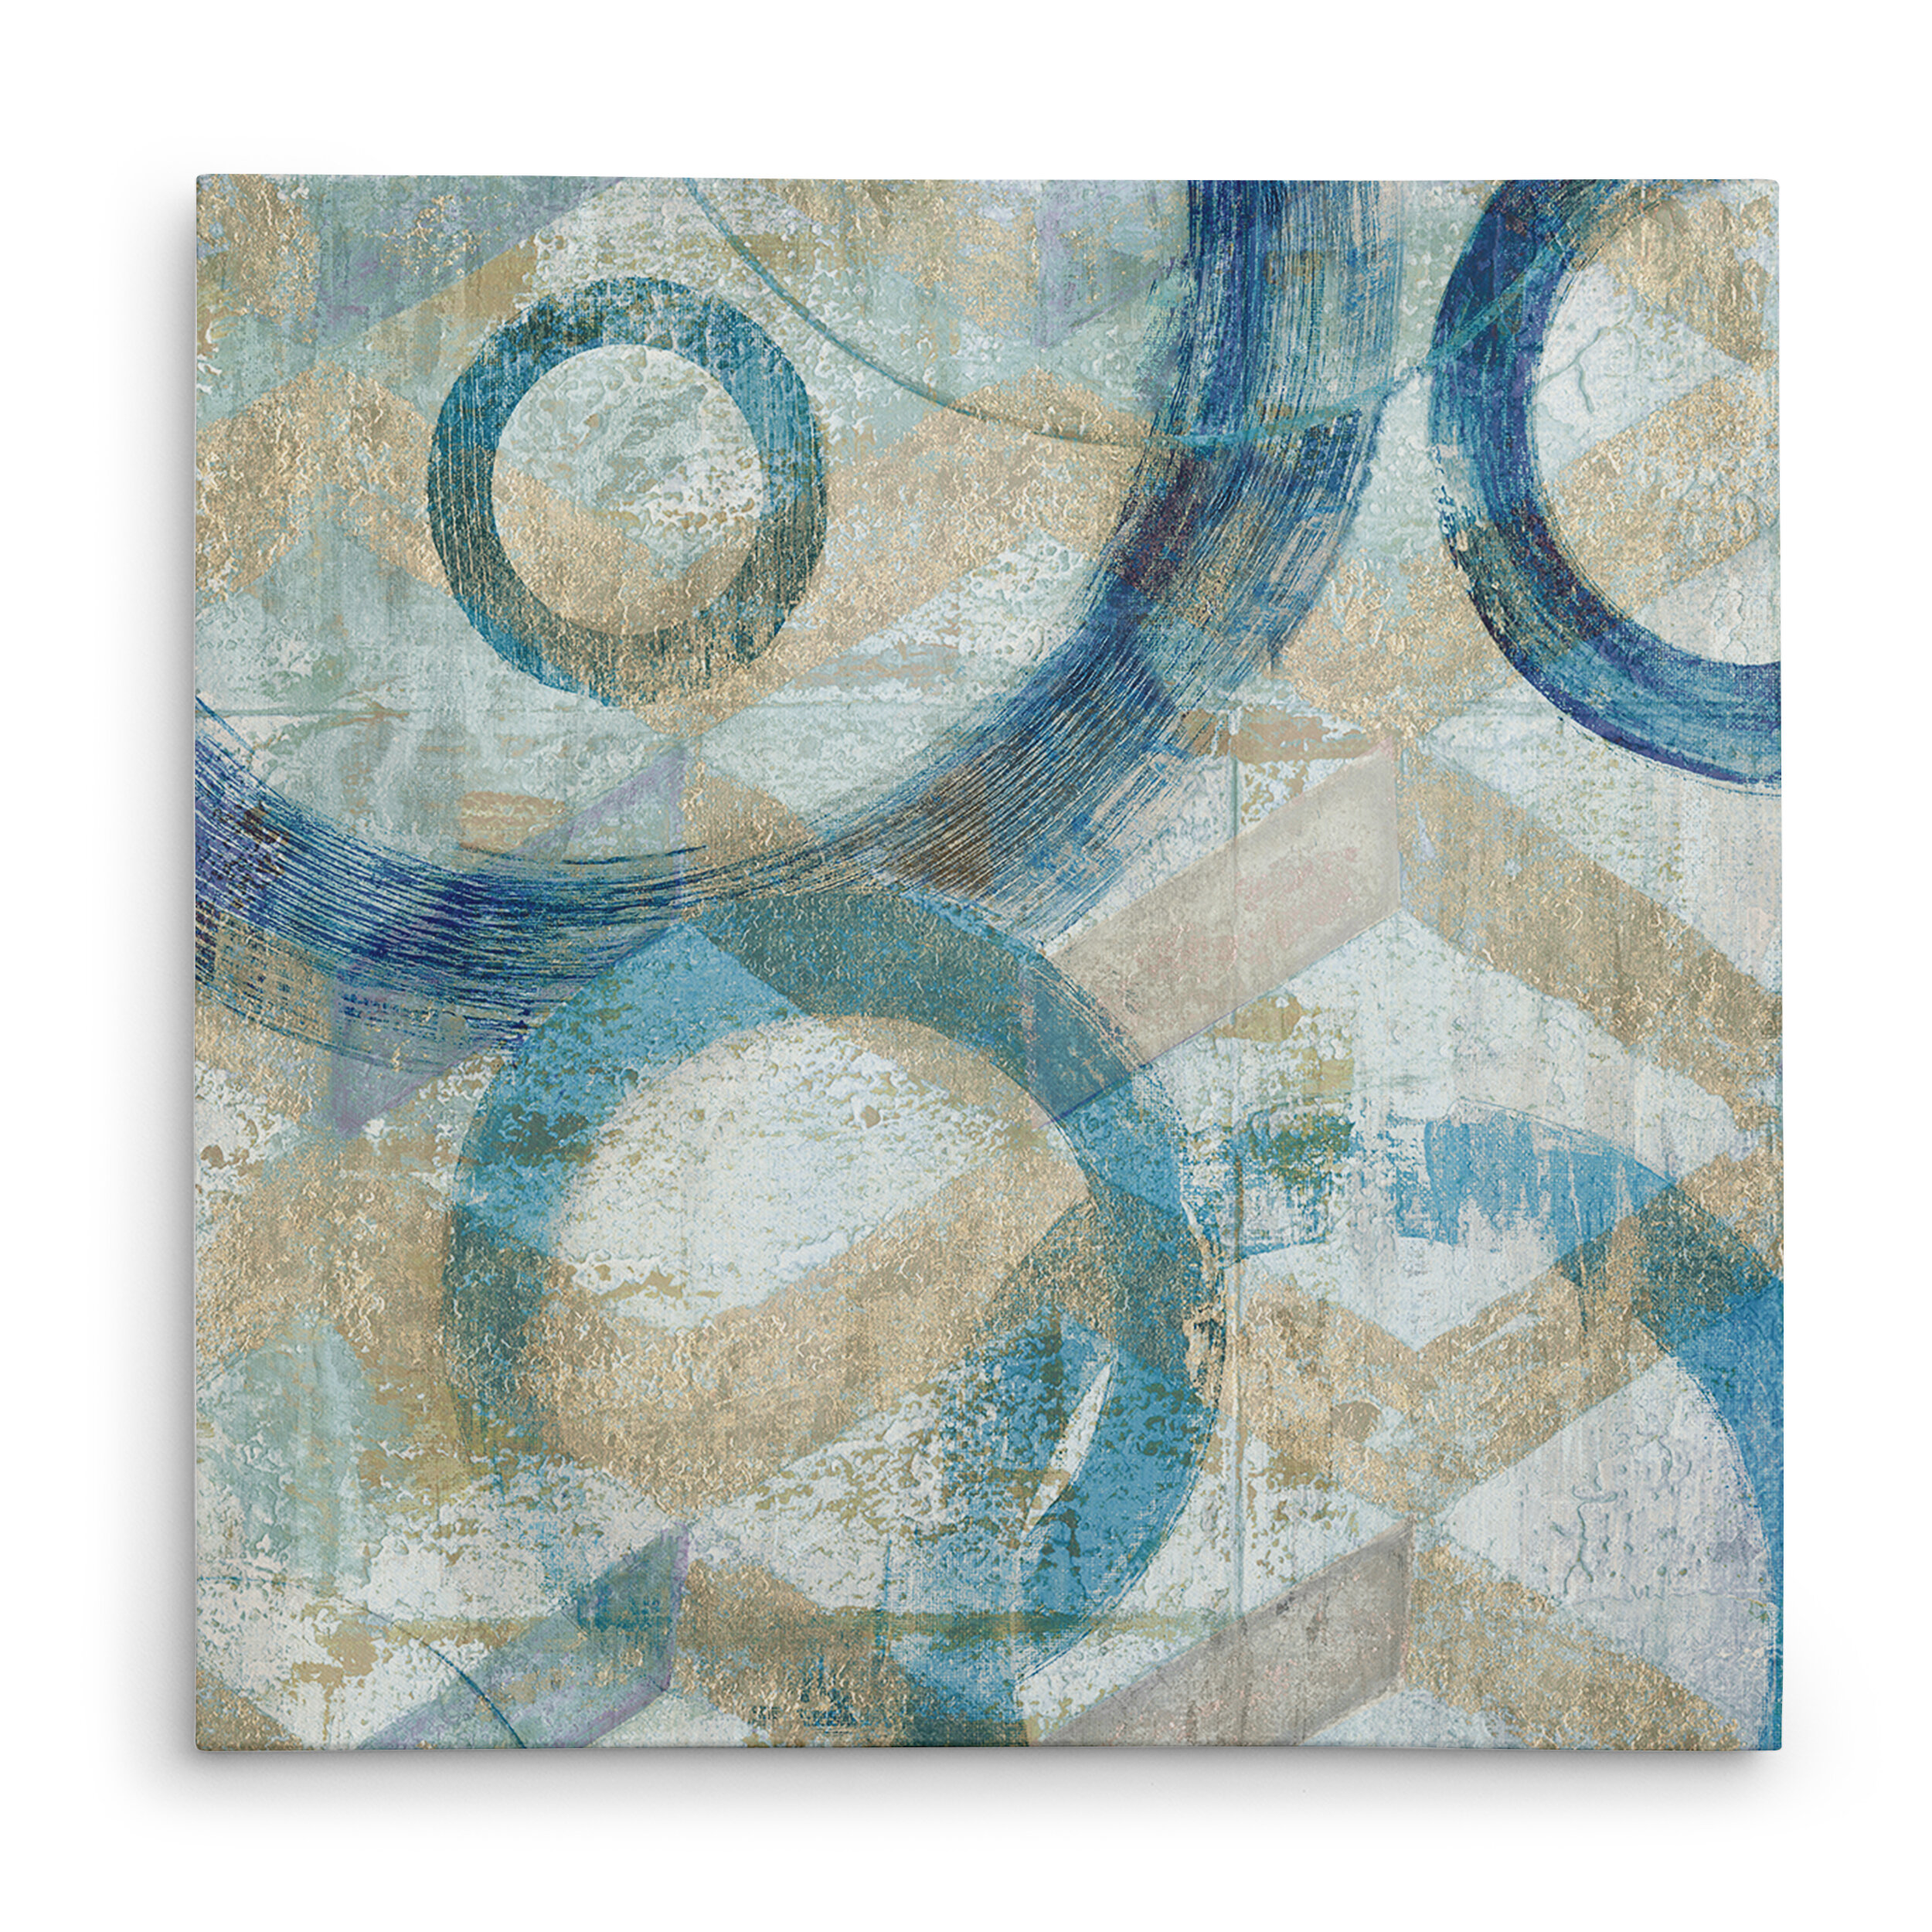 Oil Painting Latitude Run Canvas Art You Ll Love In 2021 Wayfair